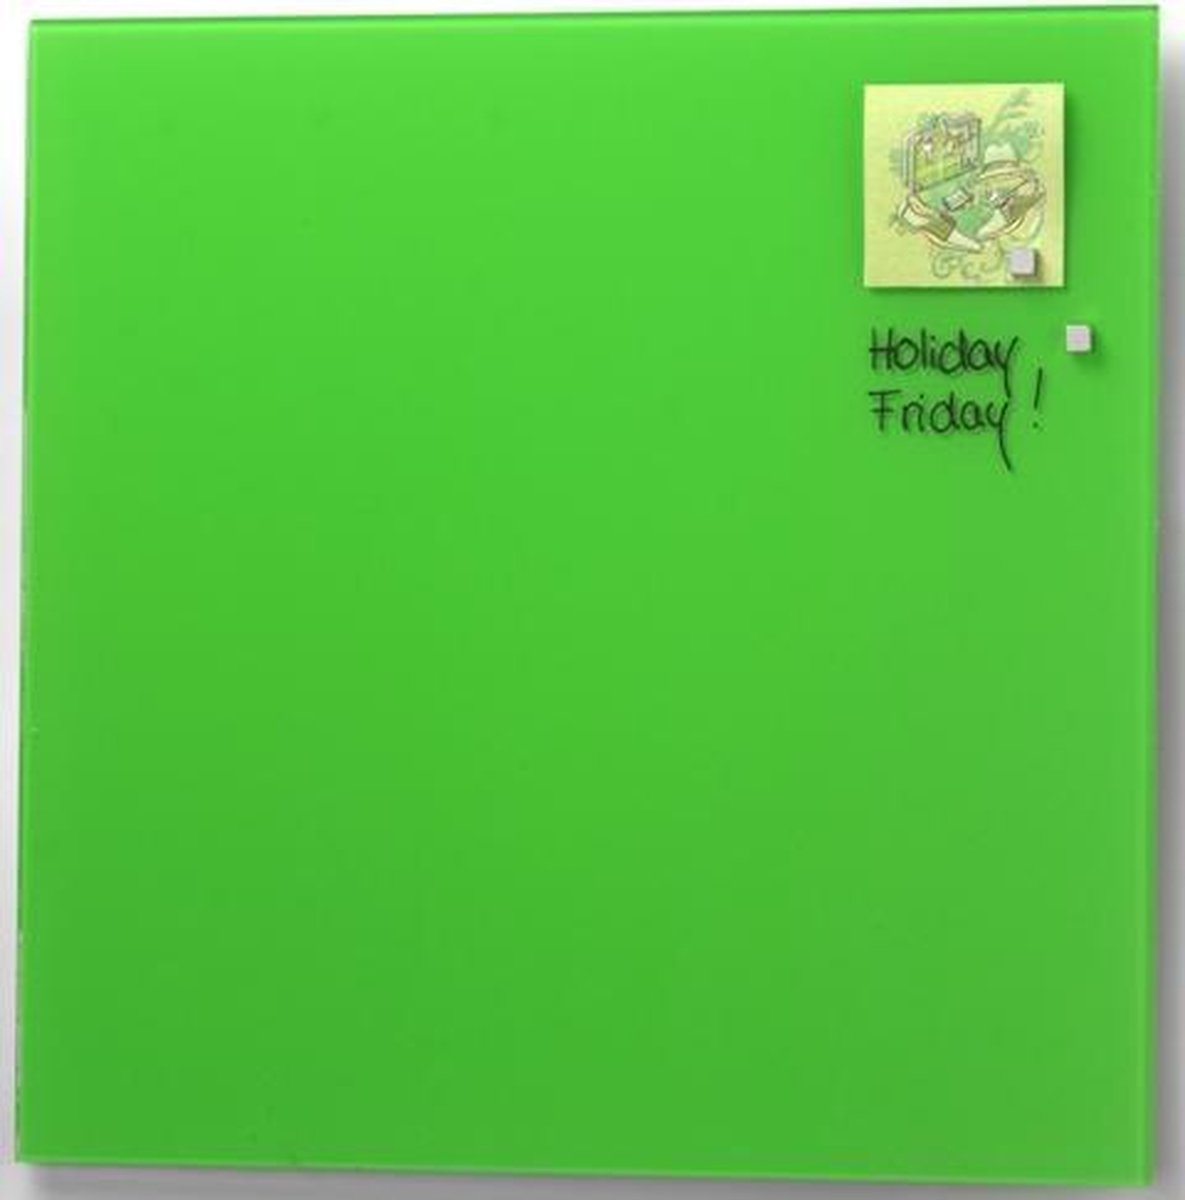 NAGA Glassboard 100x100cm Licht Groen